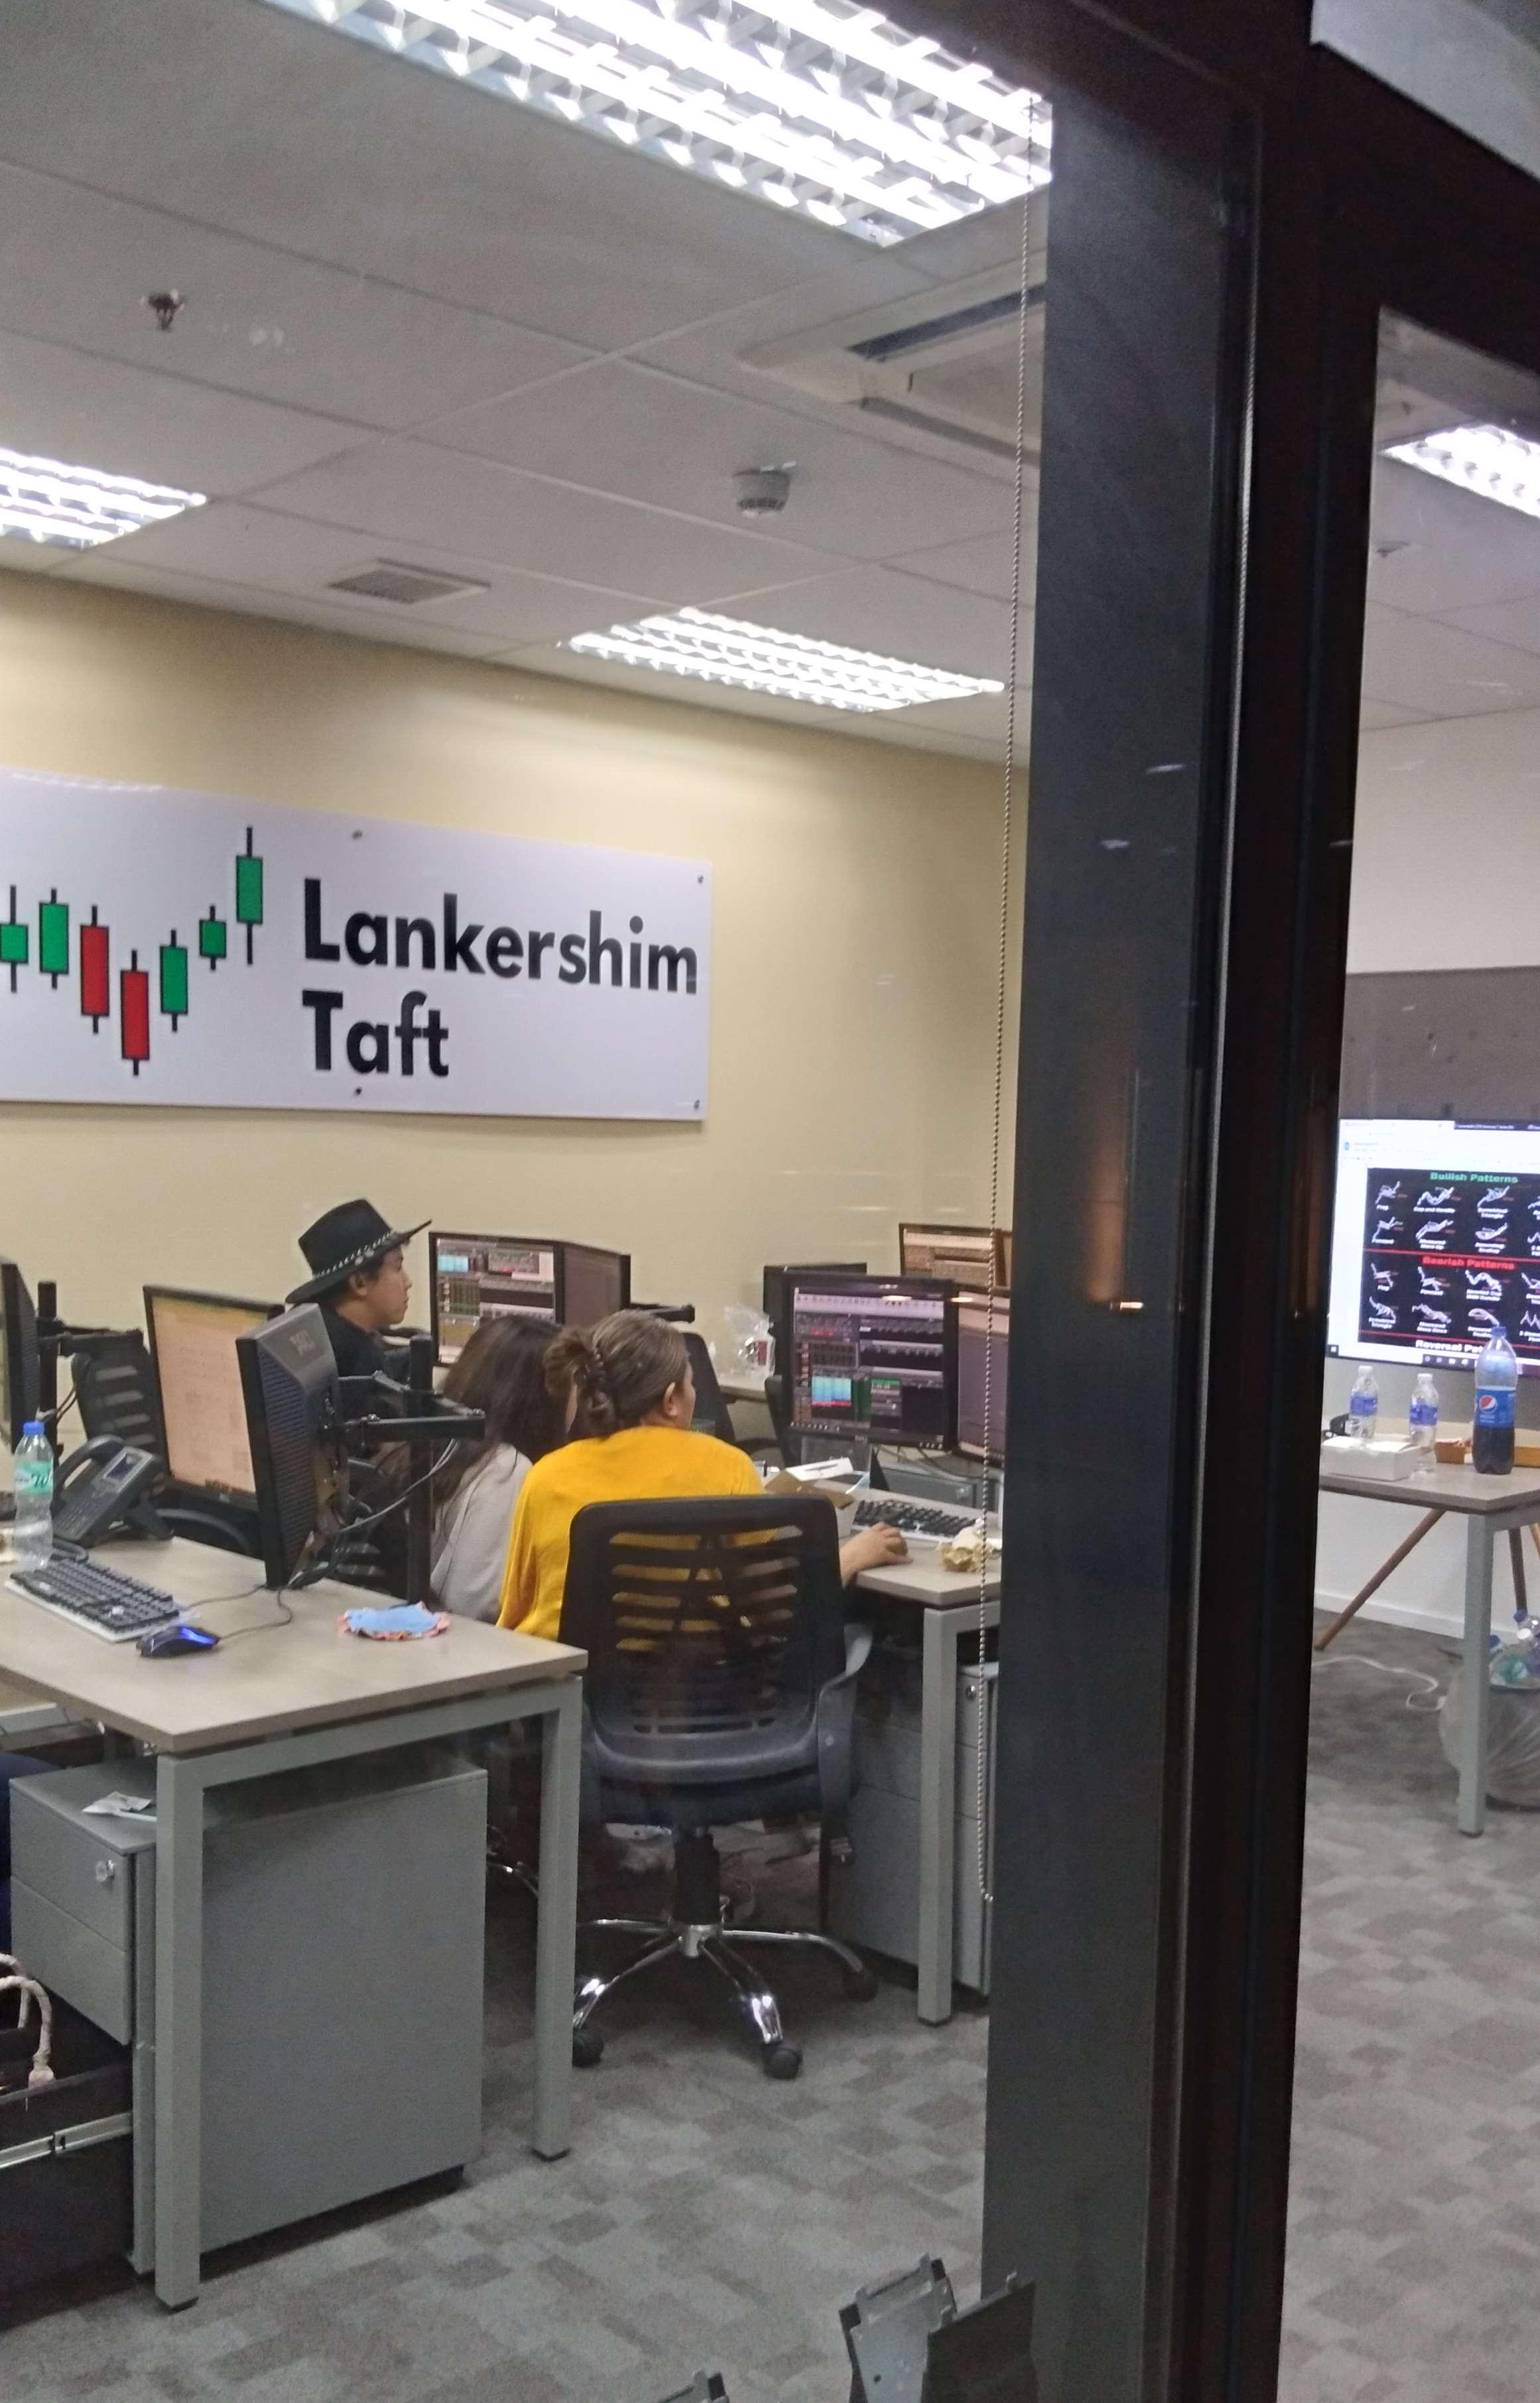 Lankershim Taft Exploring Different Venture Capital Opportunities